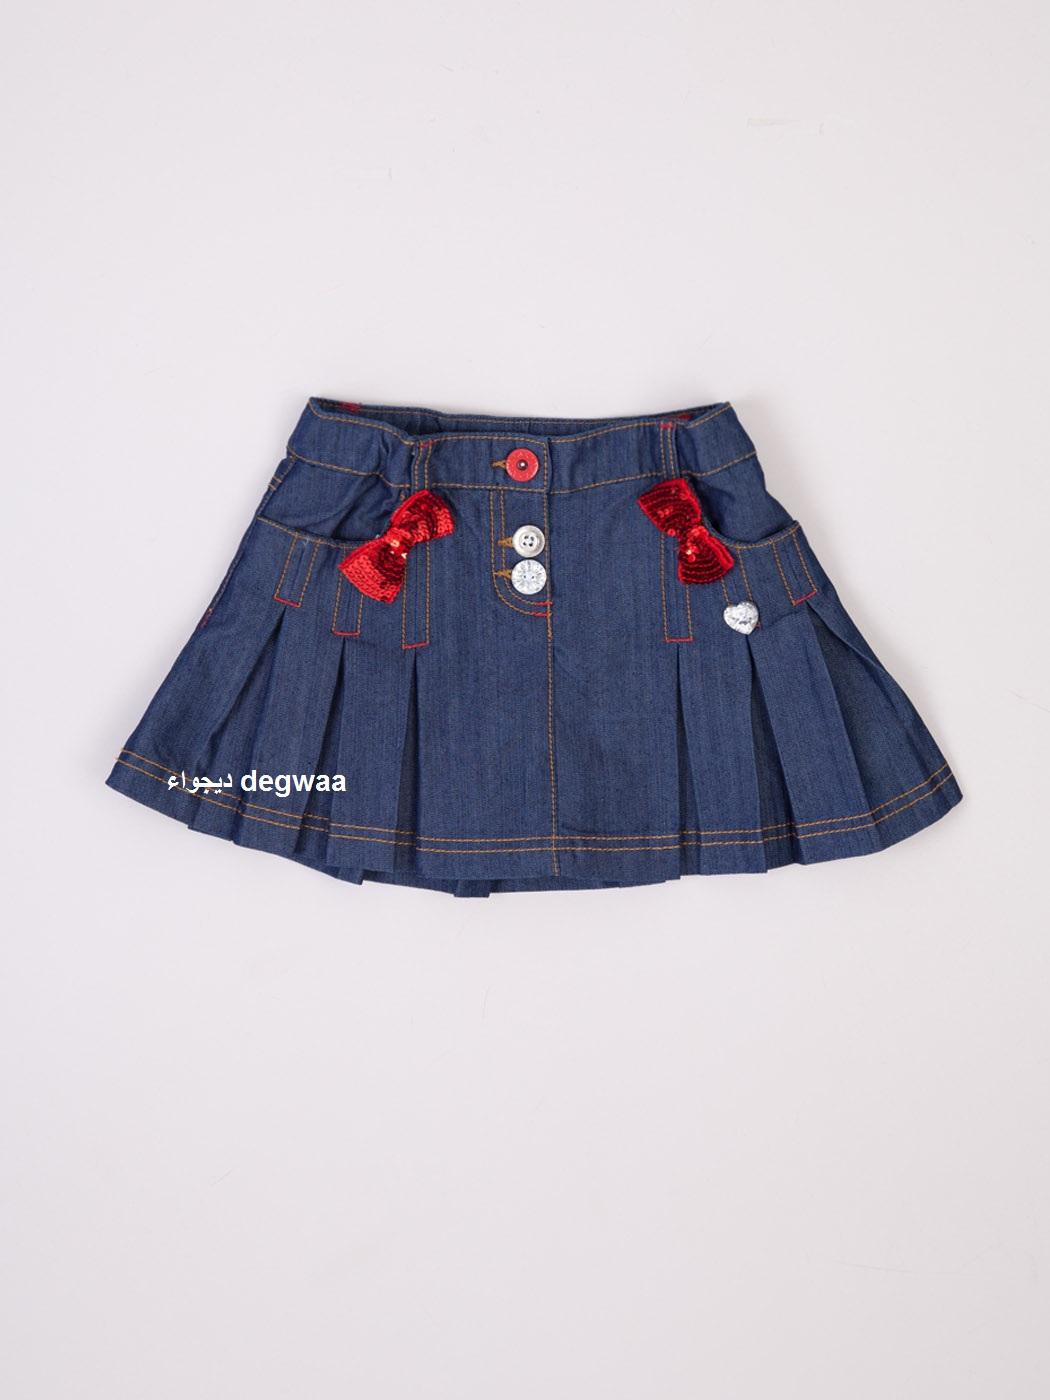 32dc7ab76 موضة جيبات الاطفال,اجمل اشكال جيبات الاطفال,احلى جيبات بنات اطفال,احدث  انواع جيبات بنوتات,اجدد موديلات جيبات ناعمة للاطفال,اروع الجيبات للبنات  الاطفال,قصات ...